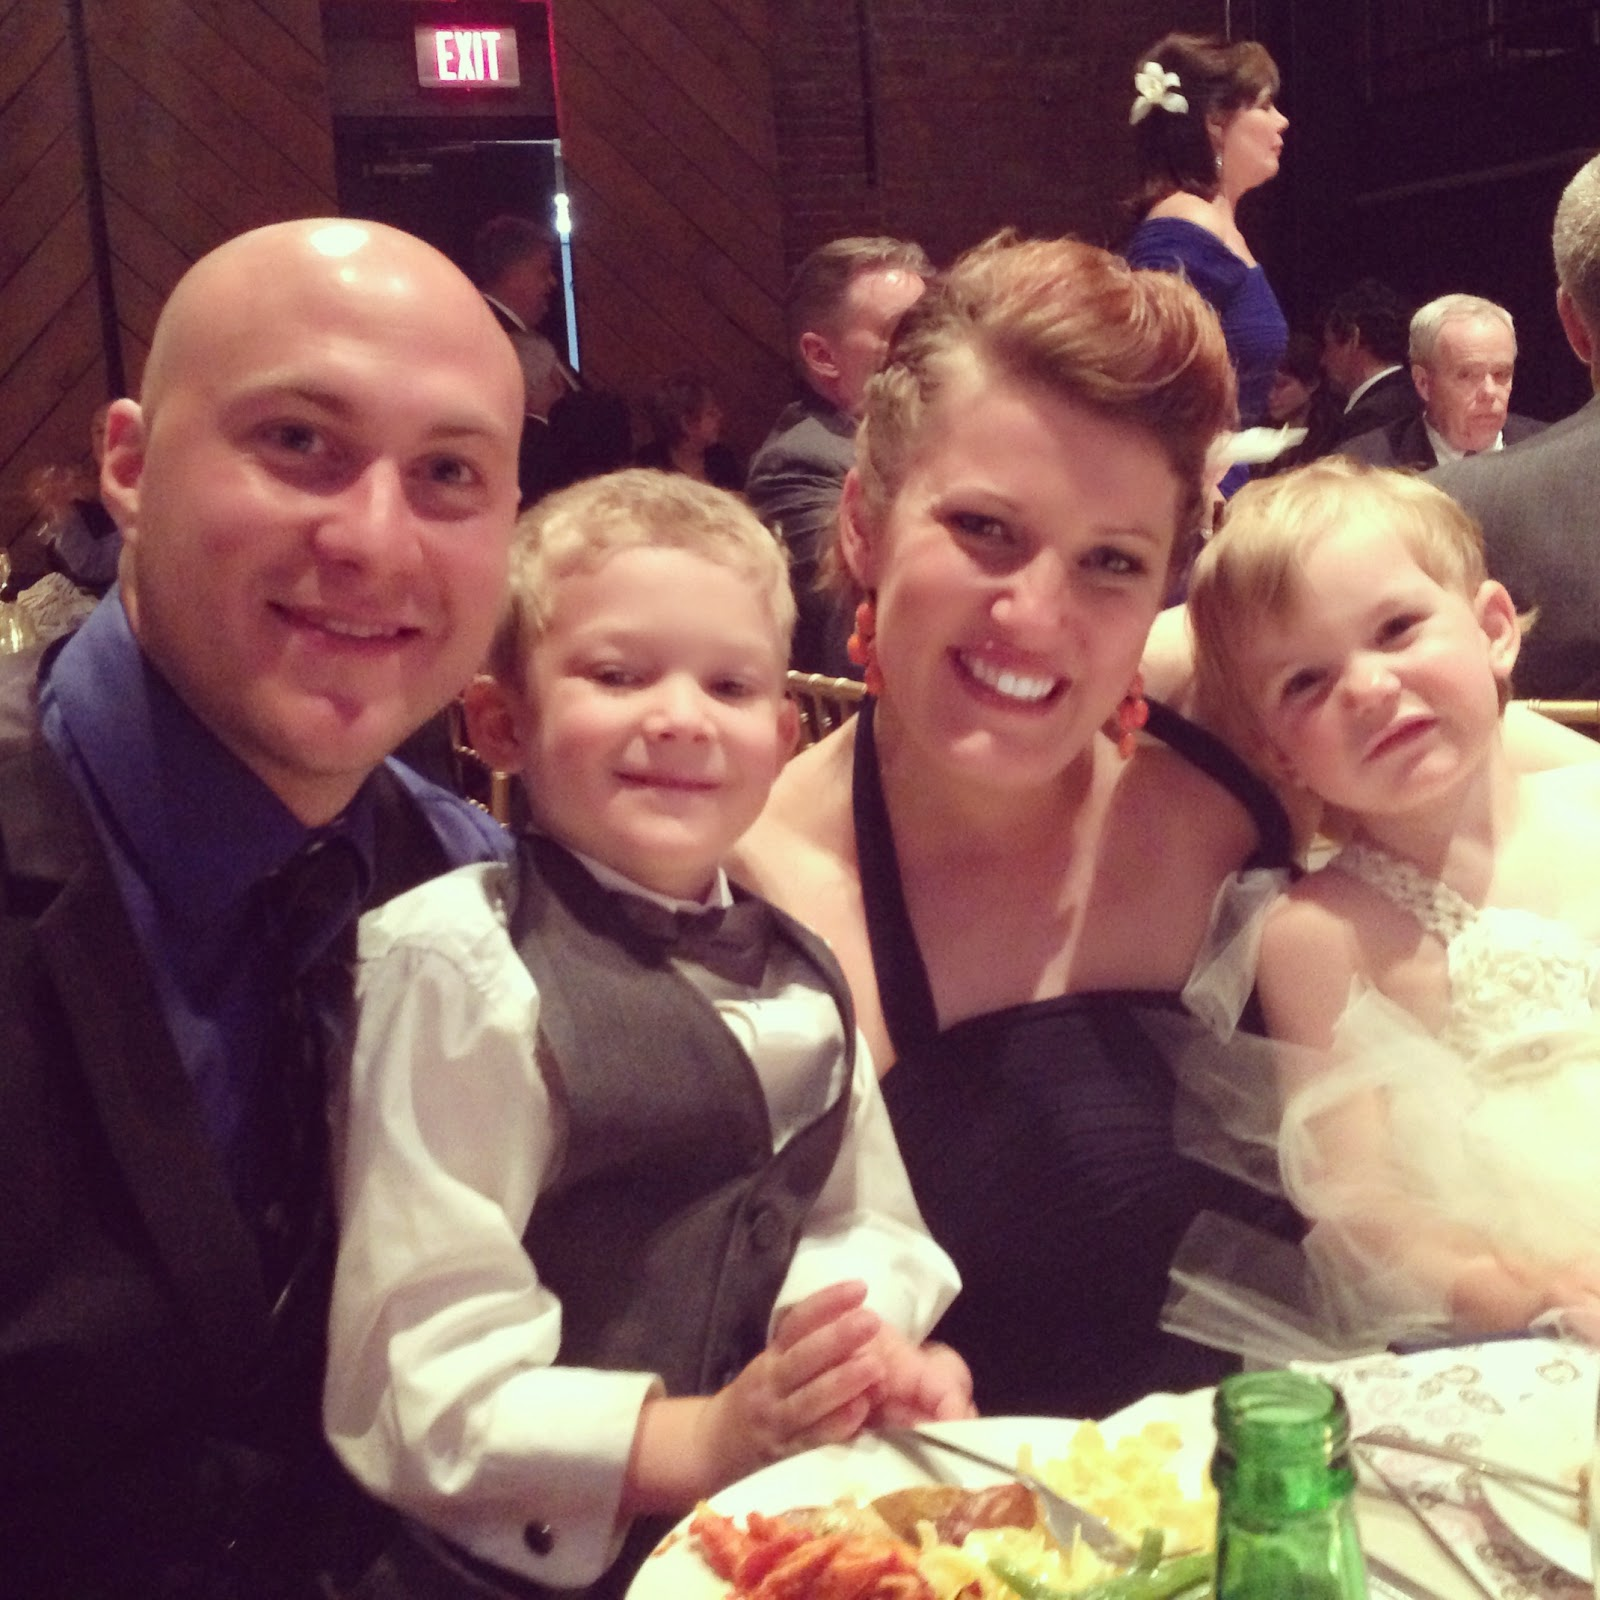 Team Studer: The Love Wedding